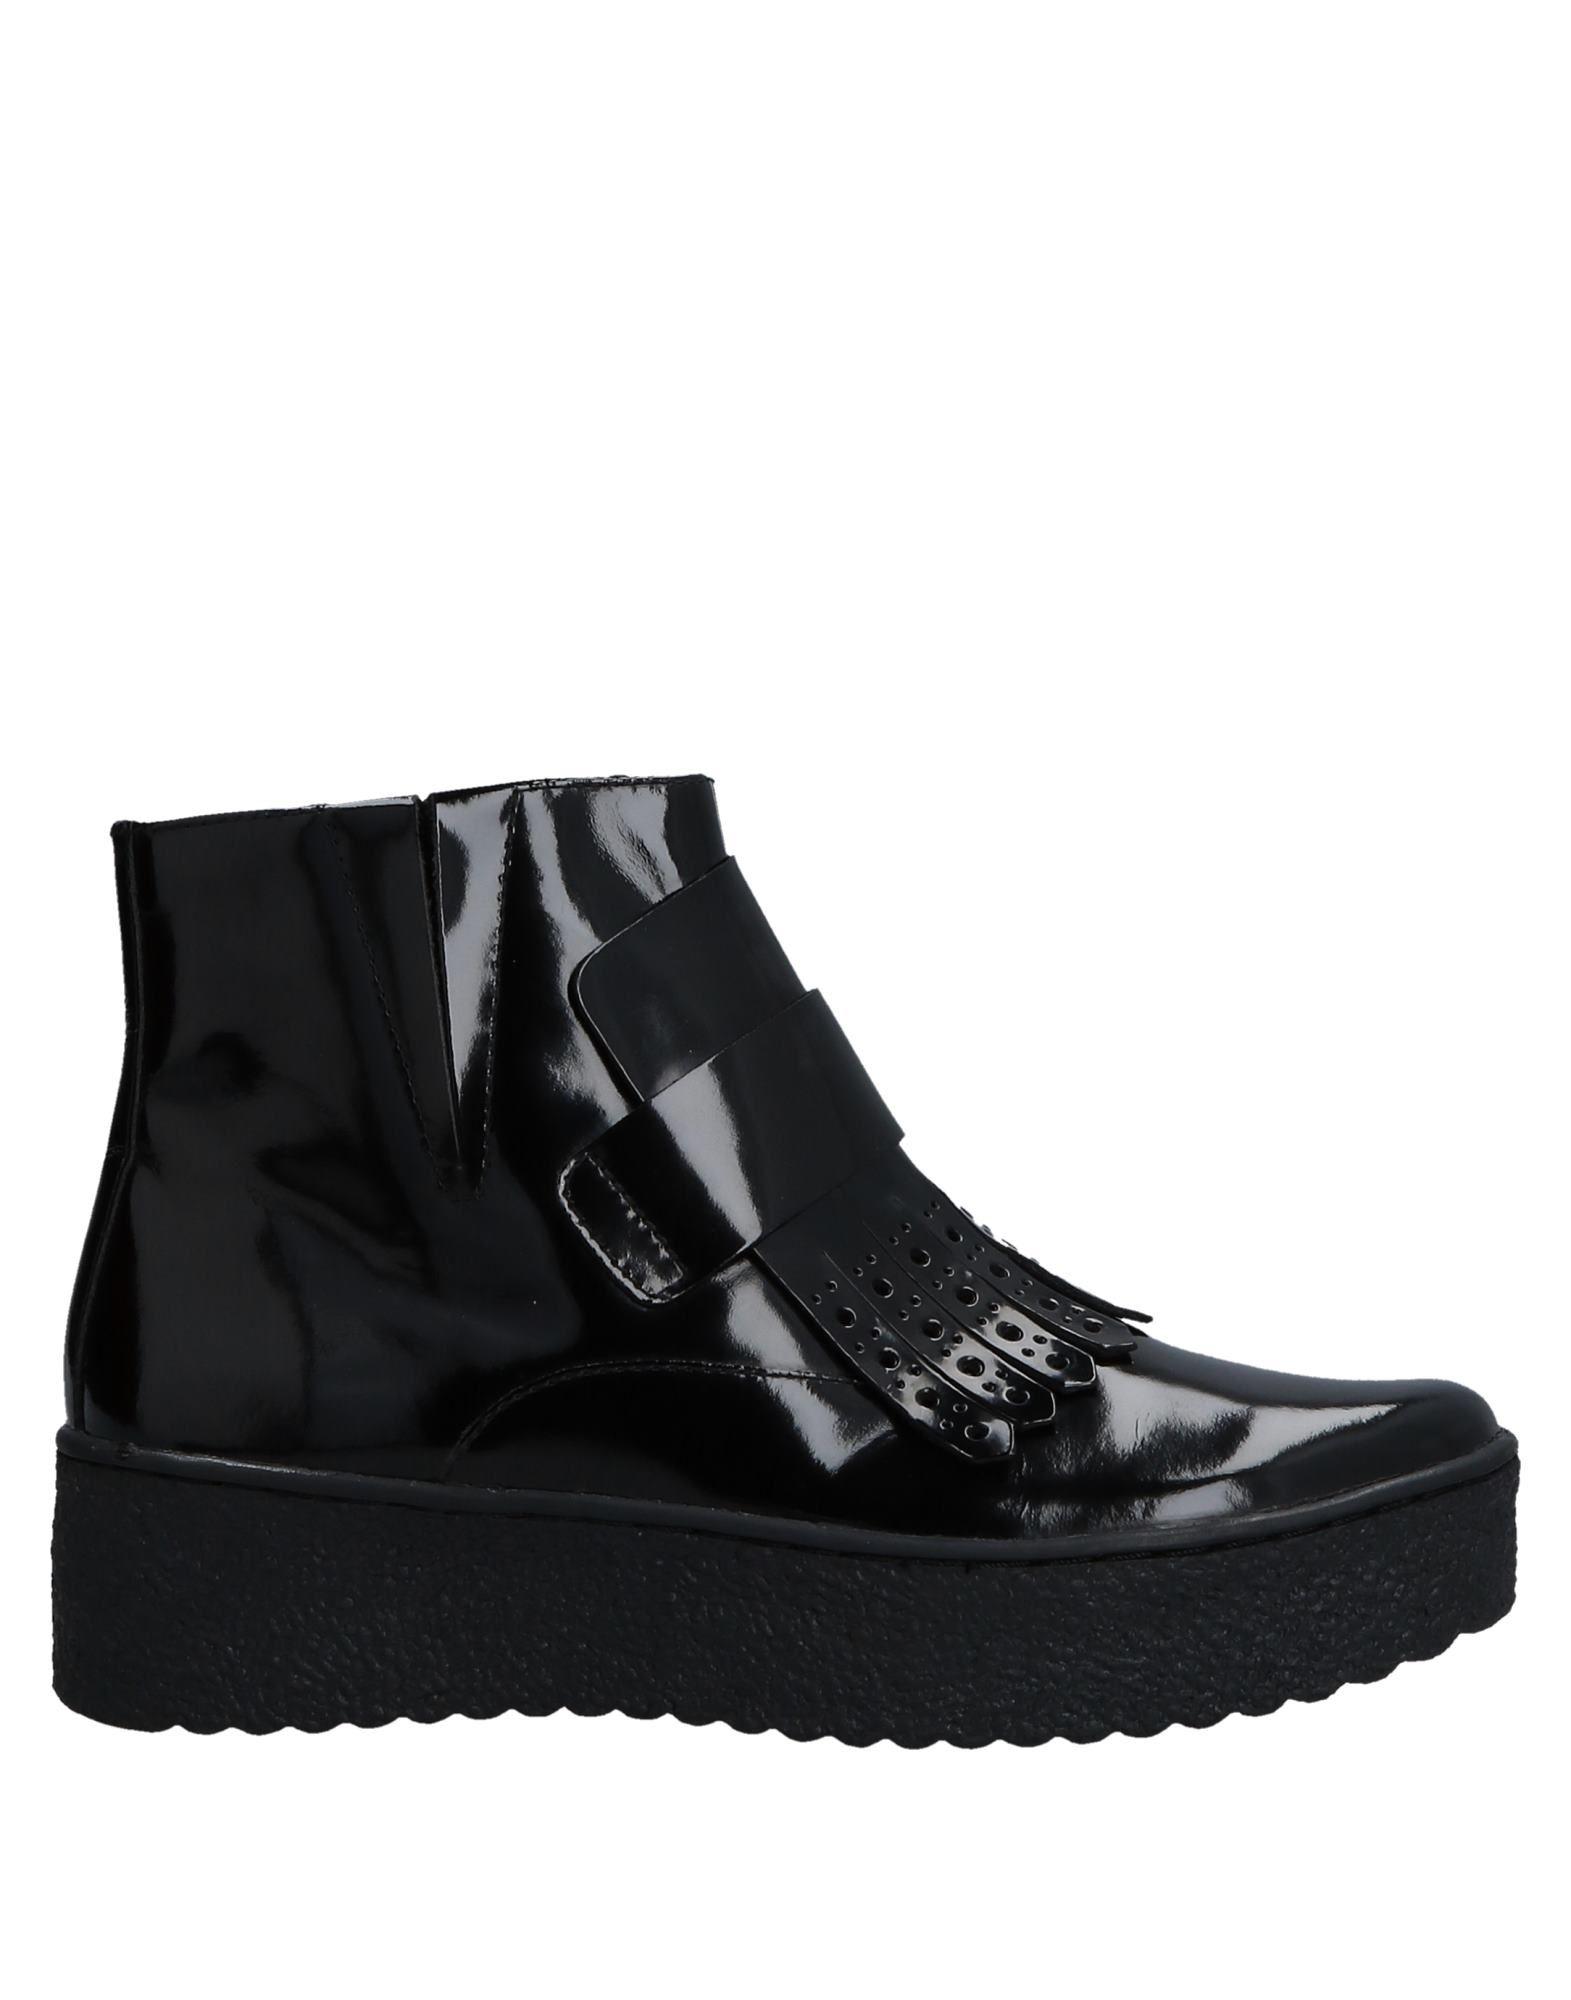 Cafènoir Stiefelette Damen  11529676GF Gute Qualität beliebte Schuhe